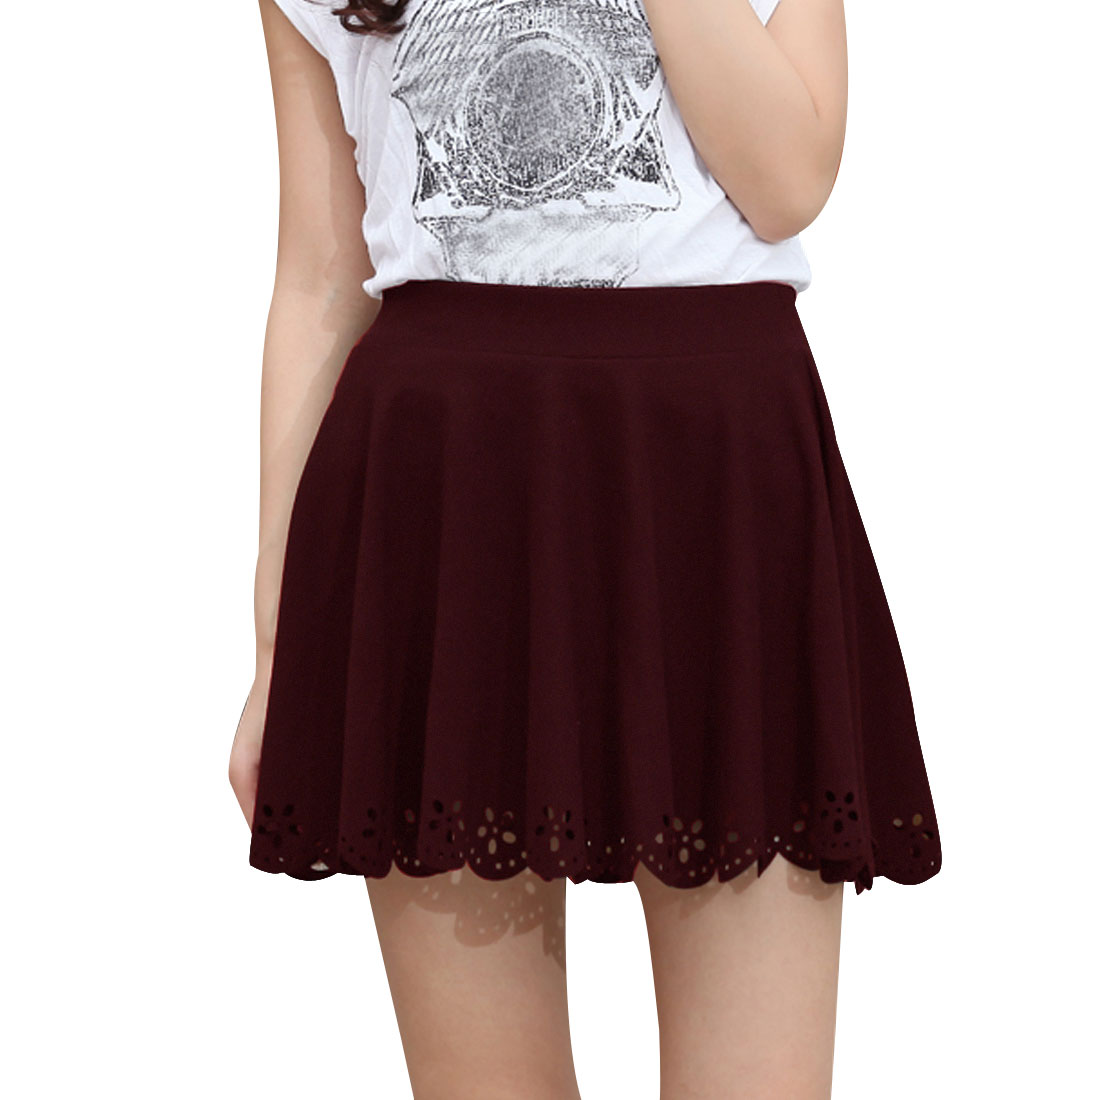 Ladies Burgundy Elastic Waist Flowers Shape Slim A-line High Waist Skirt XS